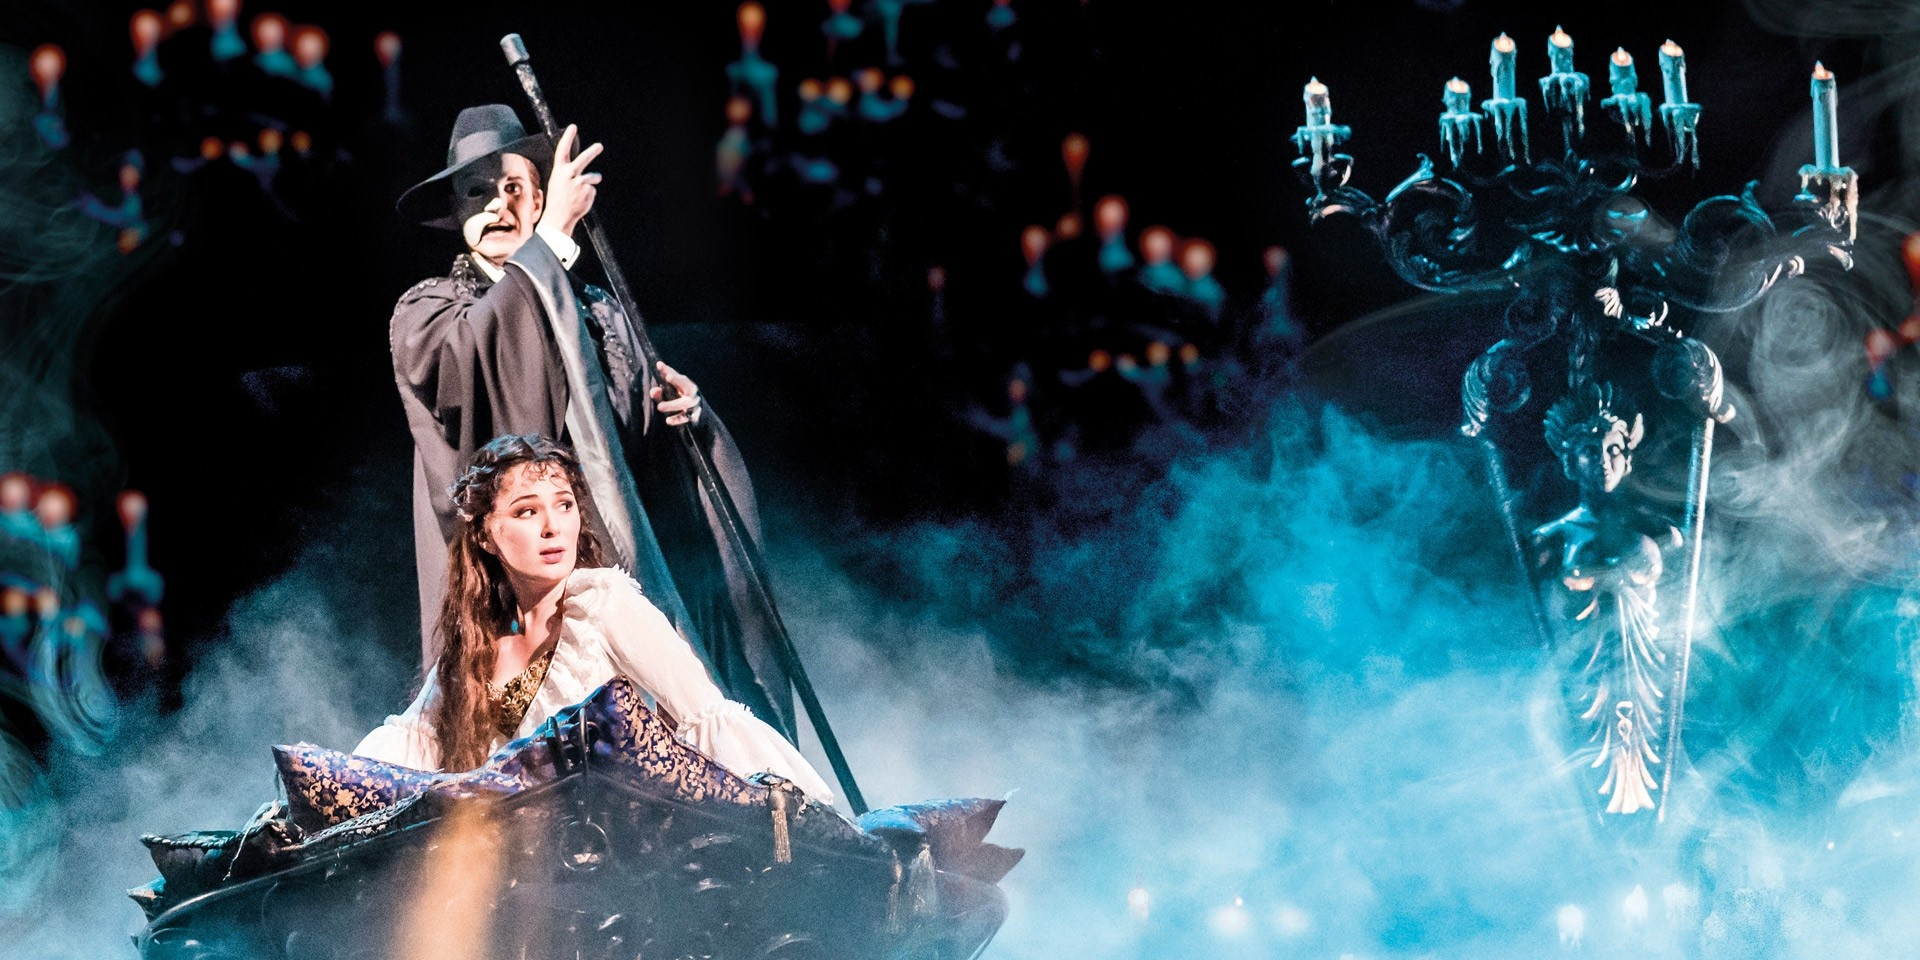 The Phantom of the Opera to return to Manila in 2019